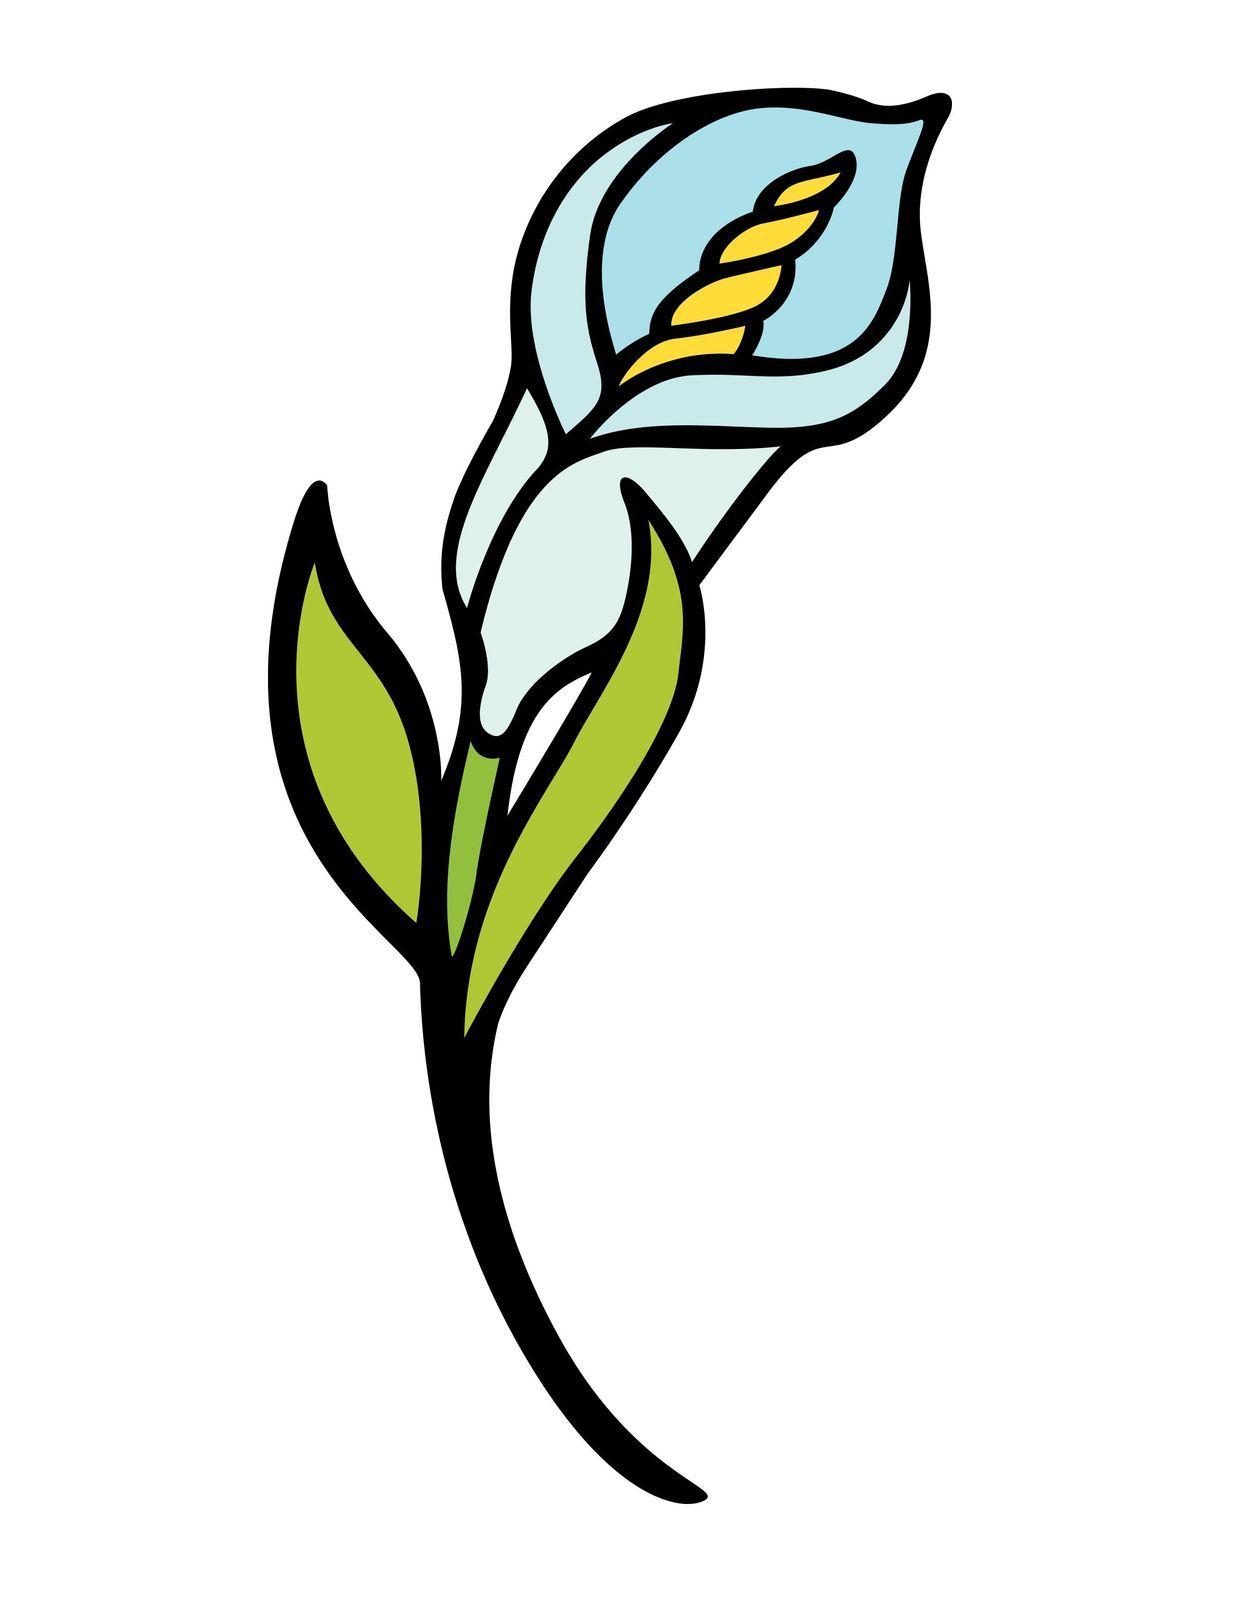 Harvest Festival Blue PrettyFlower-Digital Download-ClipArt-ArtClip-Digital Art